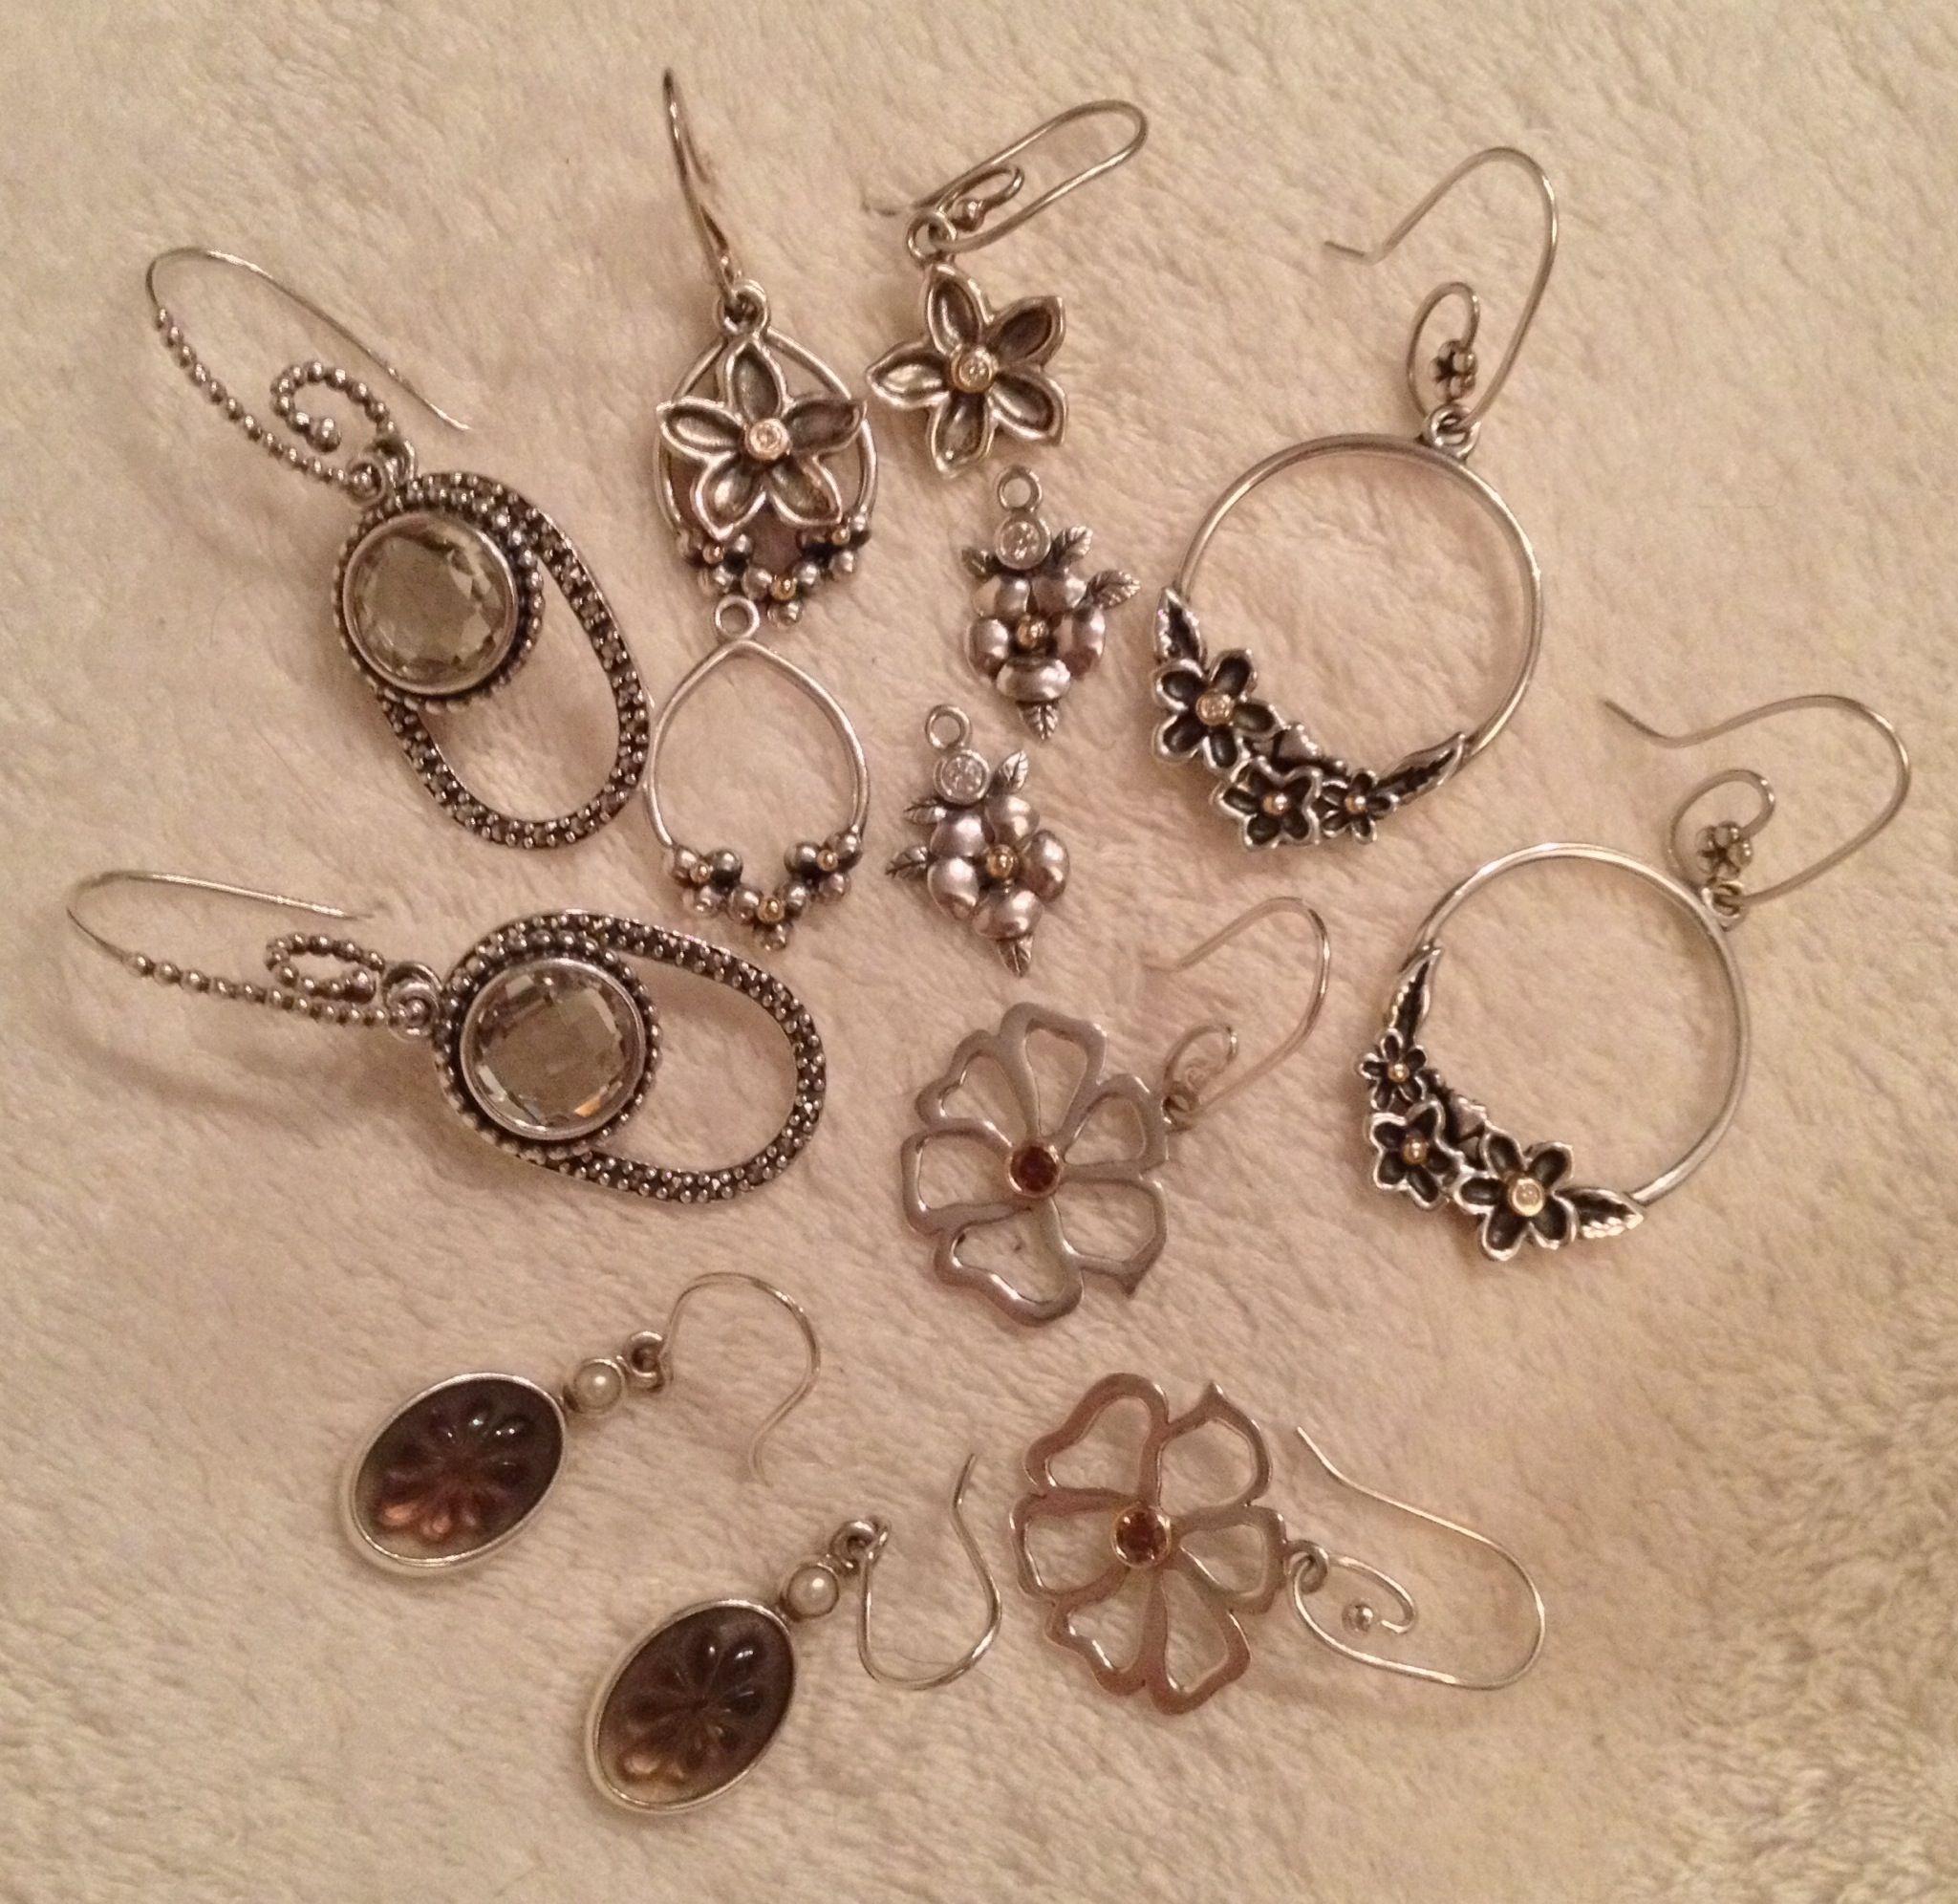 Pandora Compose Earrings: PANDORA Compose Earrings. #PANDORA #PANDORAearring